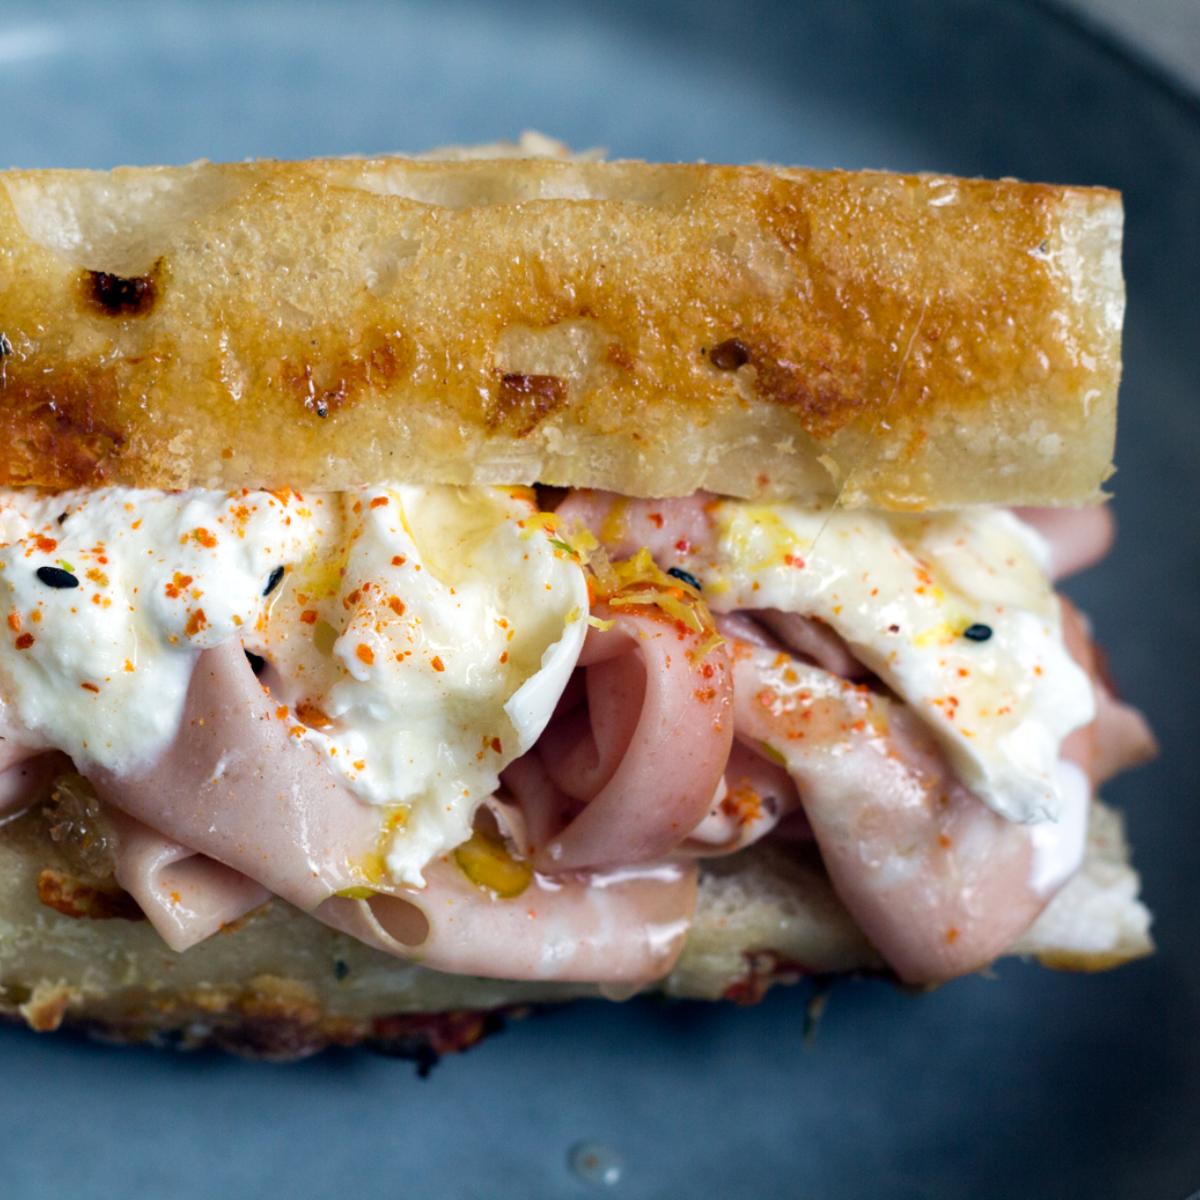 Tinman Berlin Mortadella Burrata Sandwich